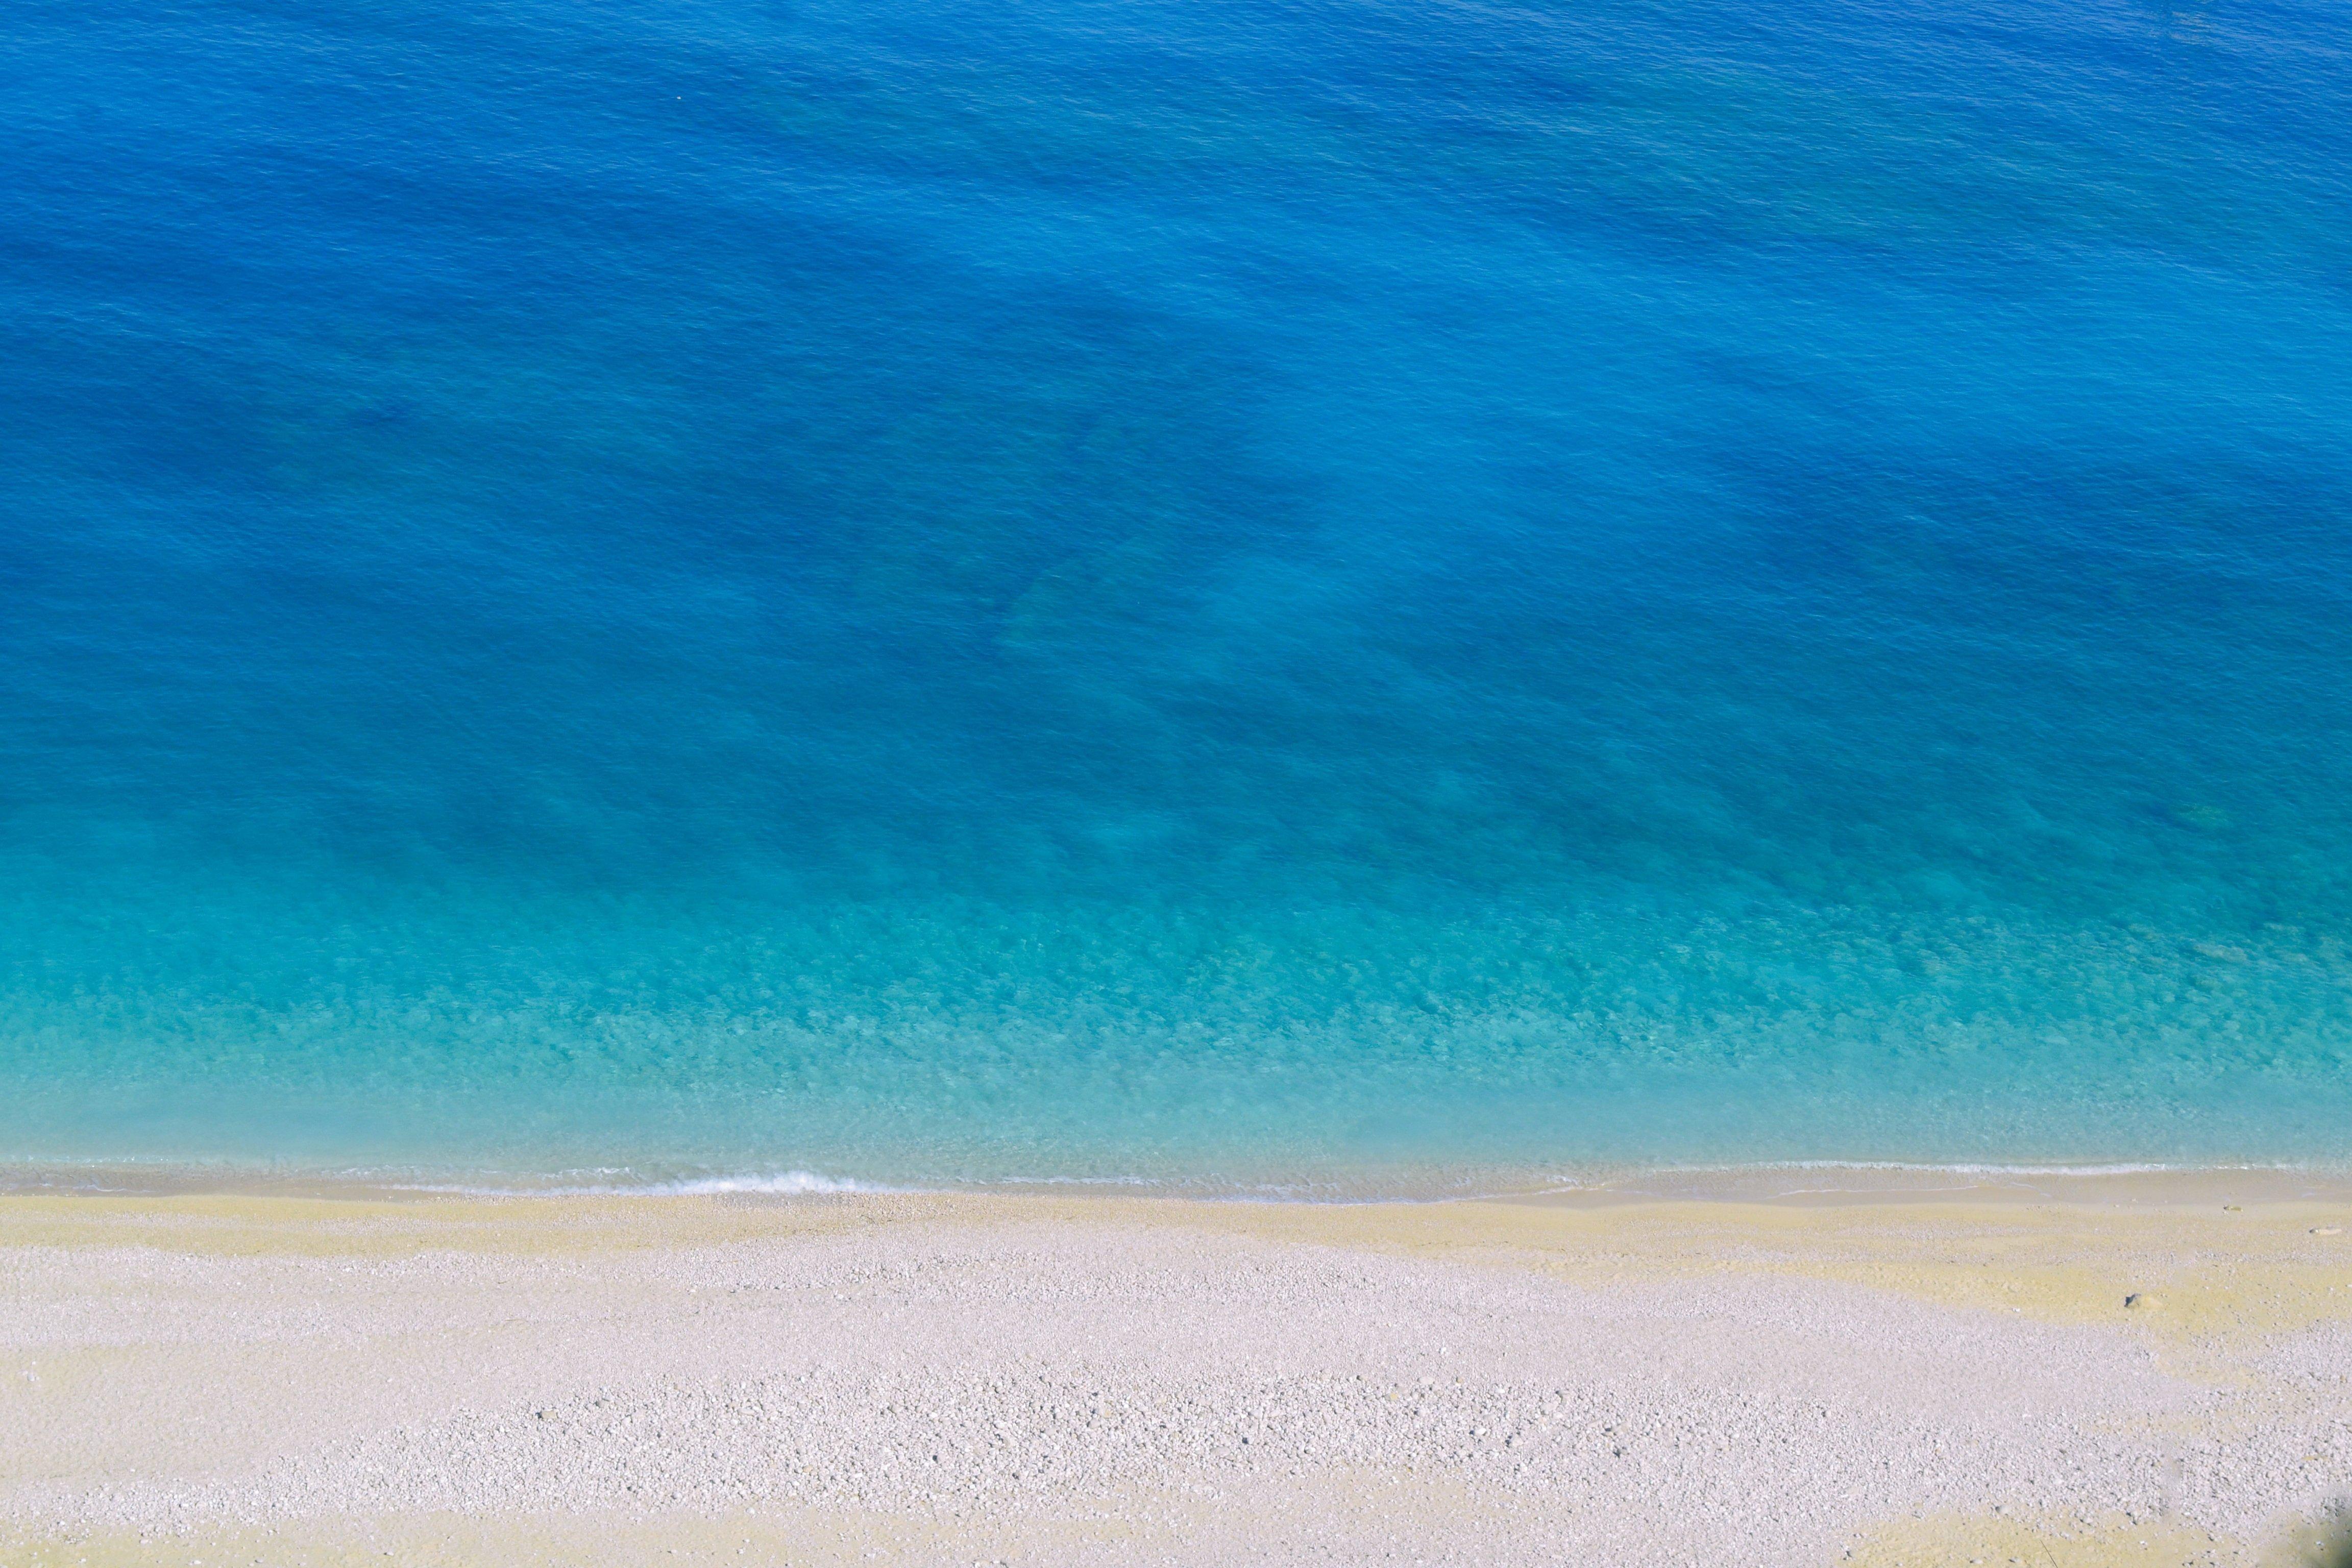 Fondos de pantalla Isla turquesa playa Vista aérea